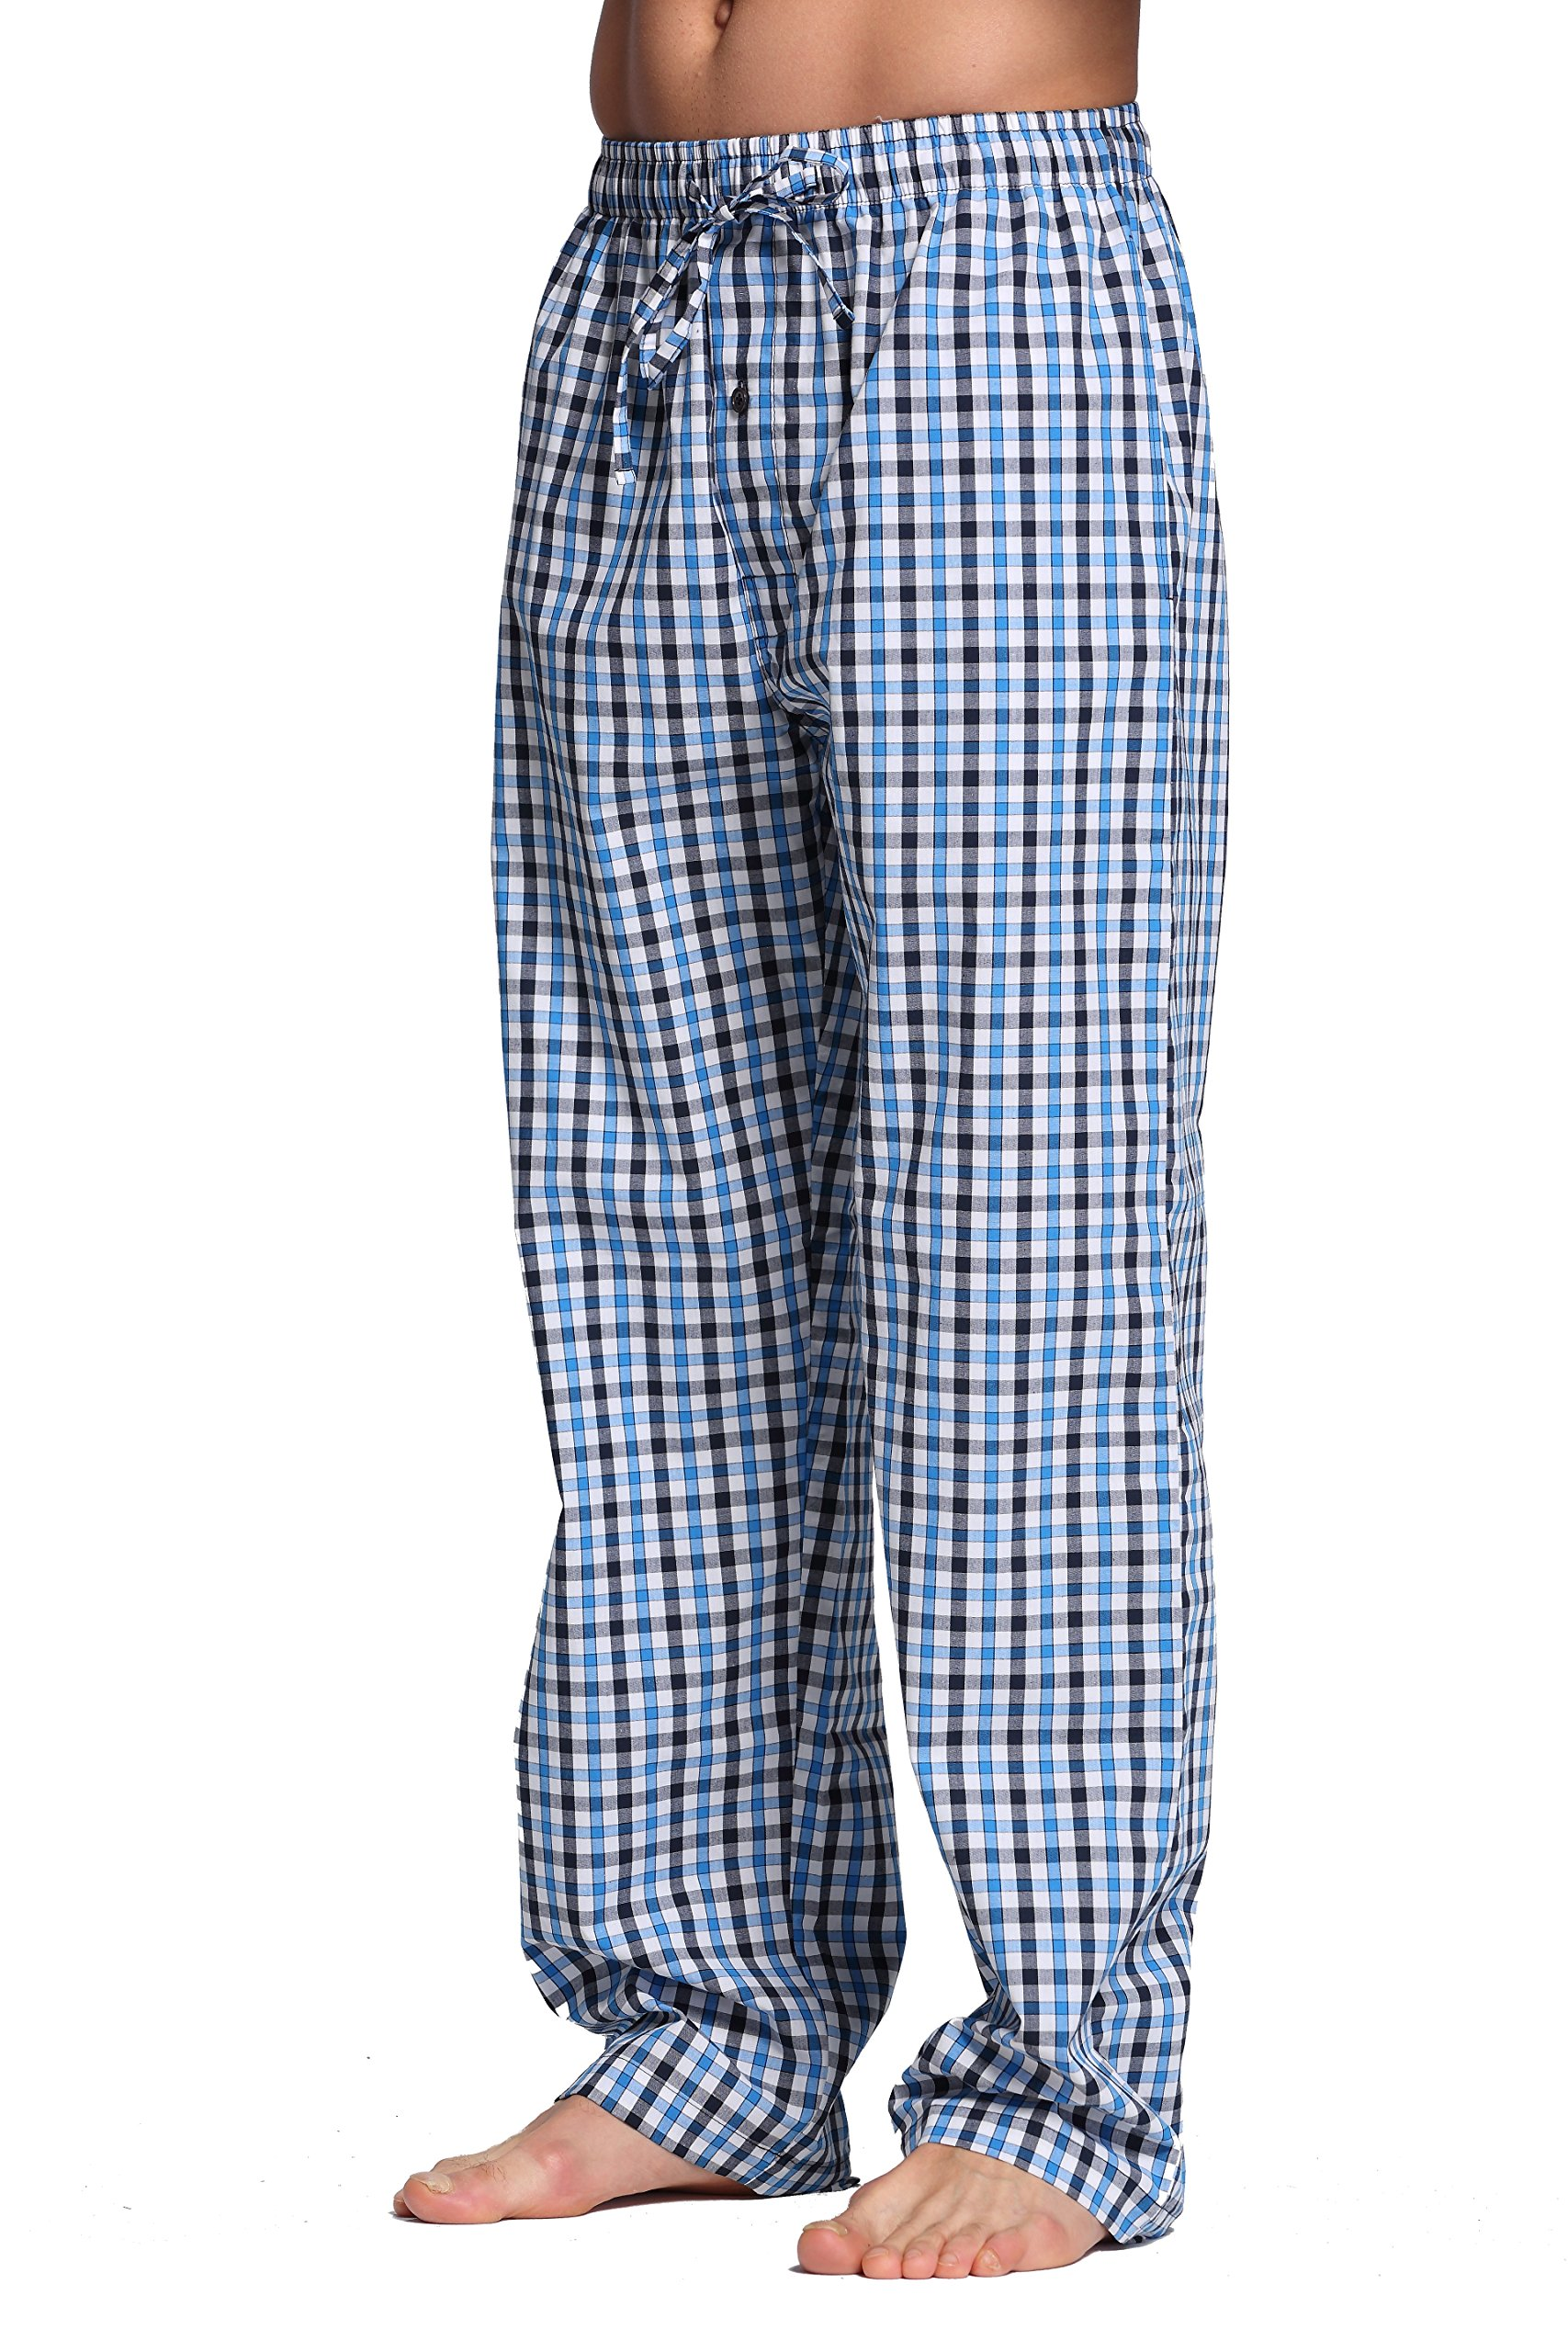 CYZ Men's 100% Cotton Poplin Pajama Lounge Sleep Pant-F1709-L by CYZ Collection